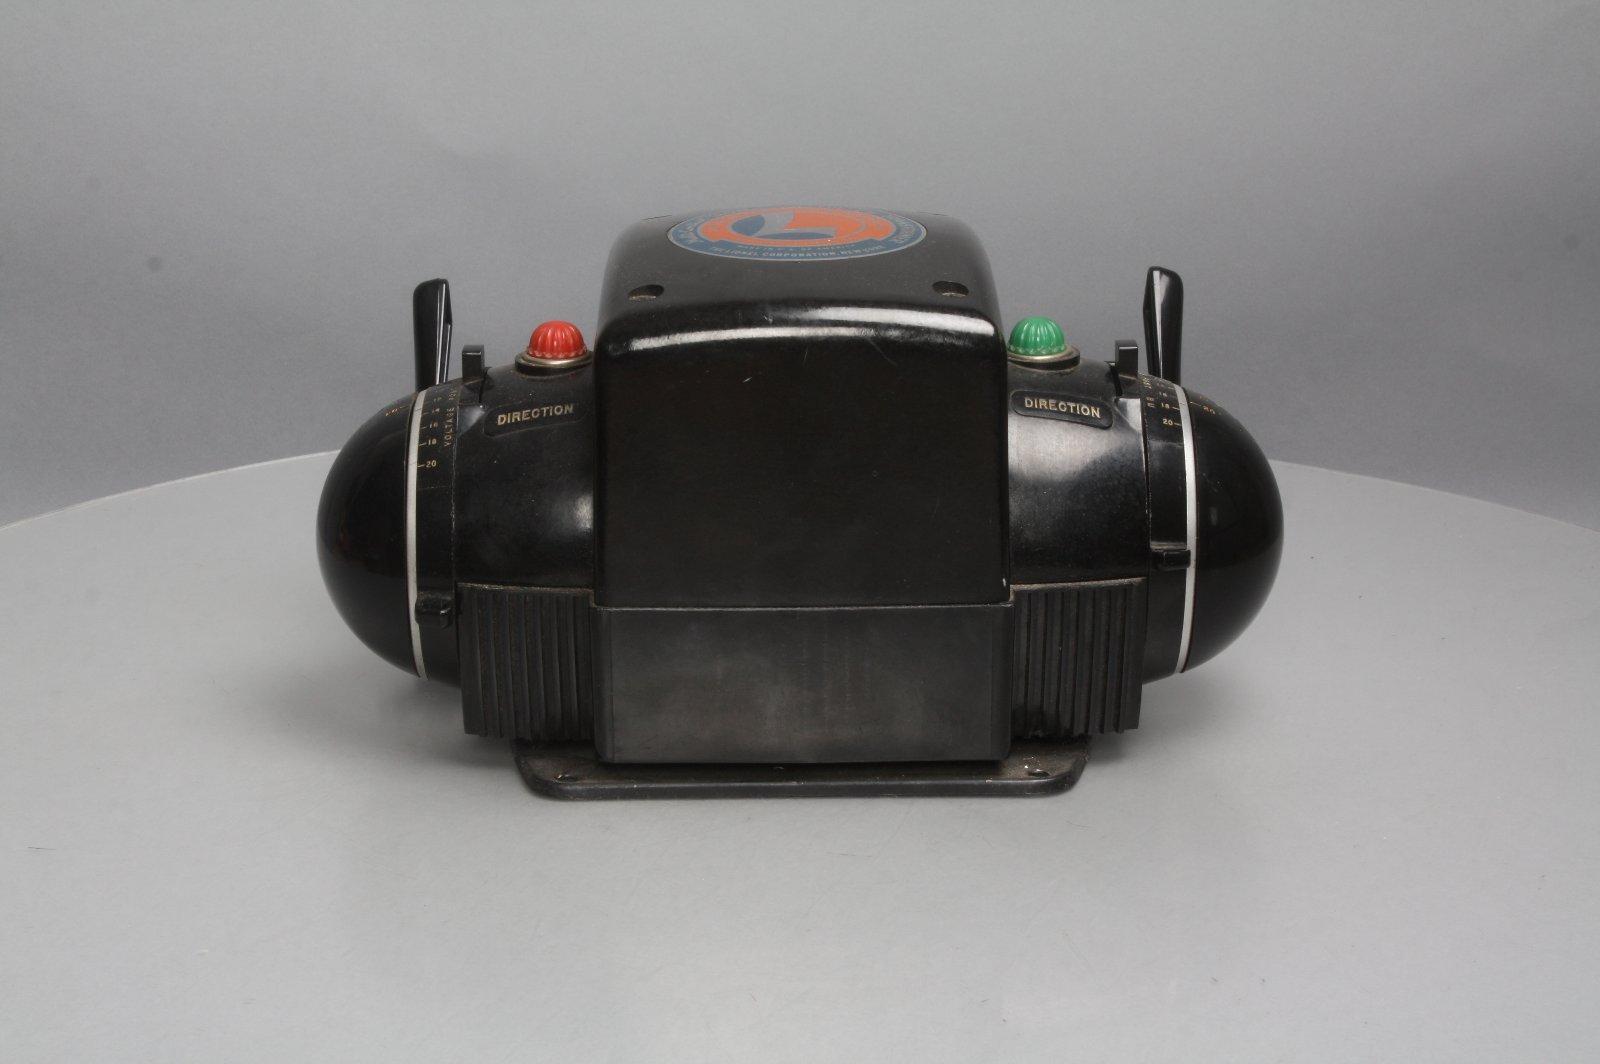 lionel zw 275 watt 4 train transformer w whistle ebay. Black Bedroom Furniture Sets. Home Design Ideas